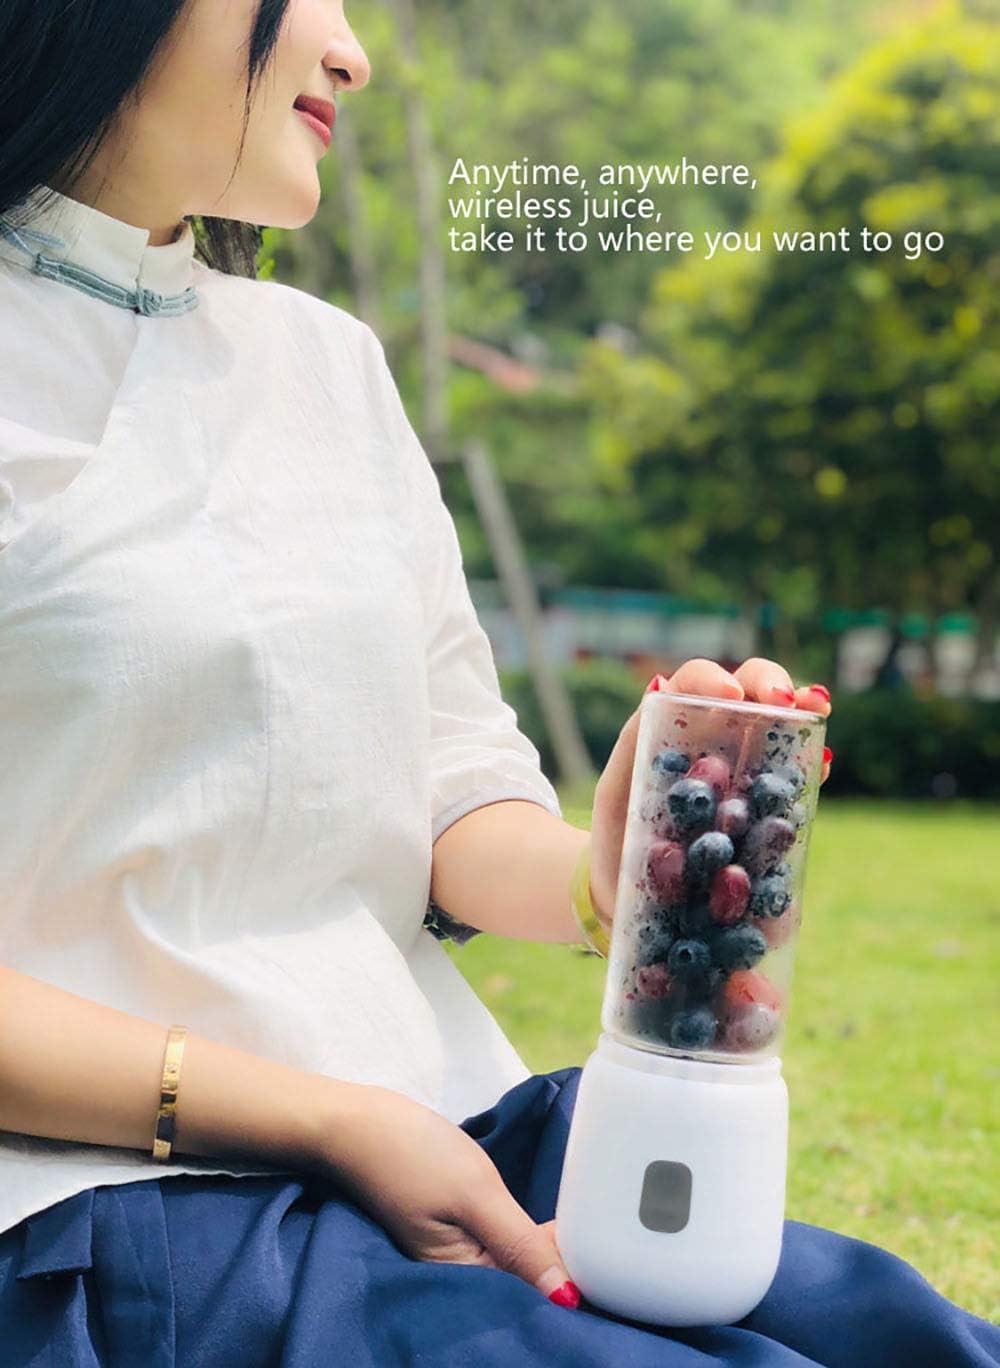 Exprimidor, mini Exprimidor taza eléctrica máquina de jugo de frutas estudiante hogar pequeño multifunción portátil recargable,White Blanco